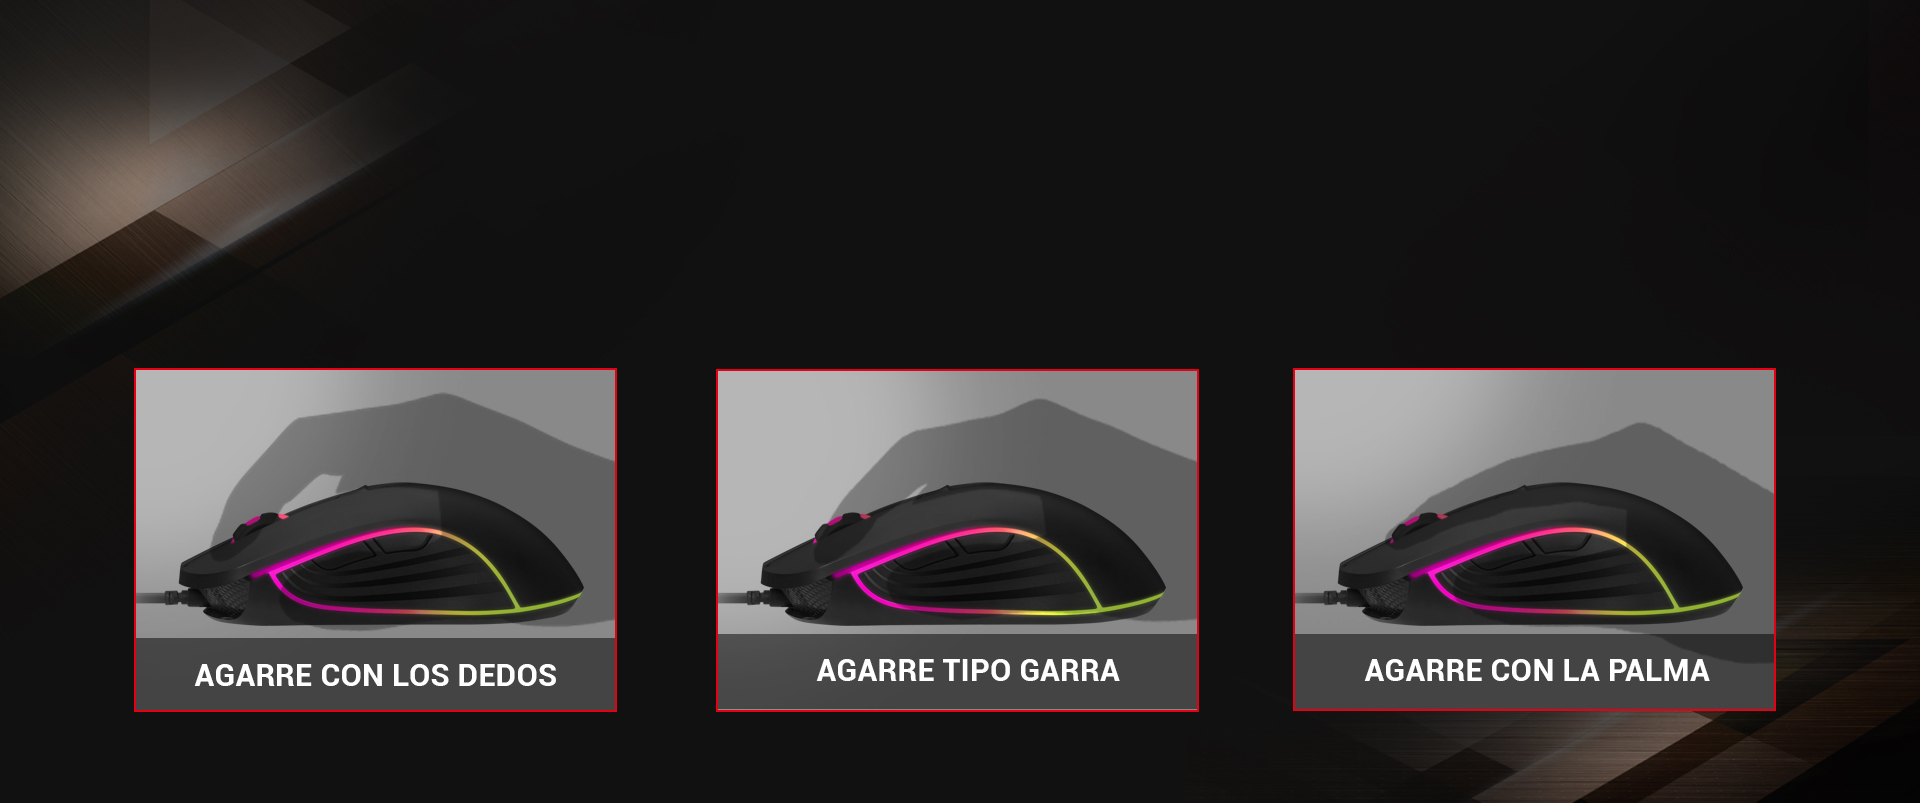 Ratón Gaming Astra M30 imagen descripción agarre